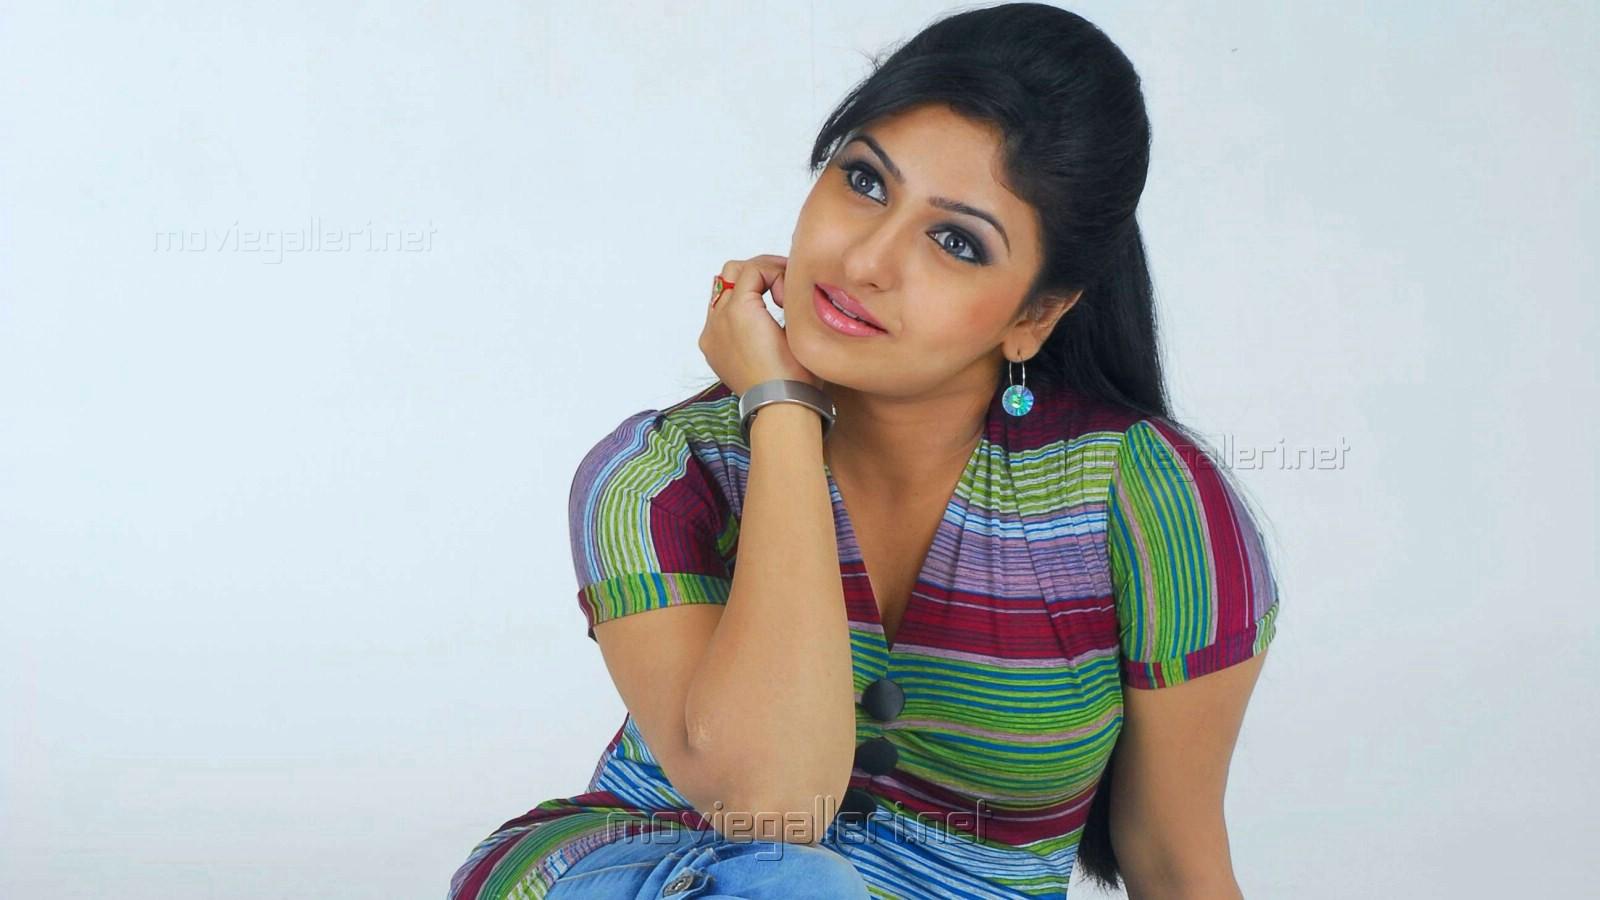 tamil actresses wallpapers - sf wallpaper